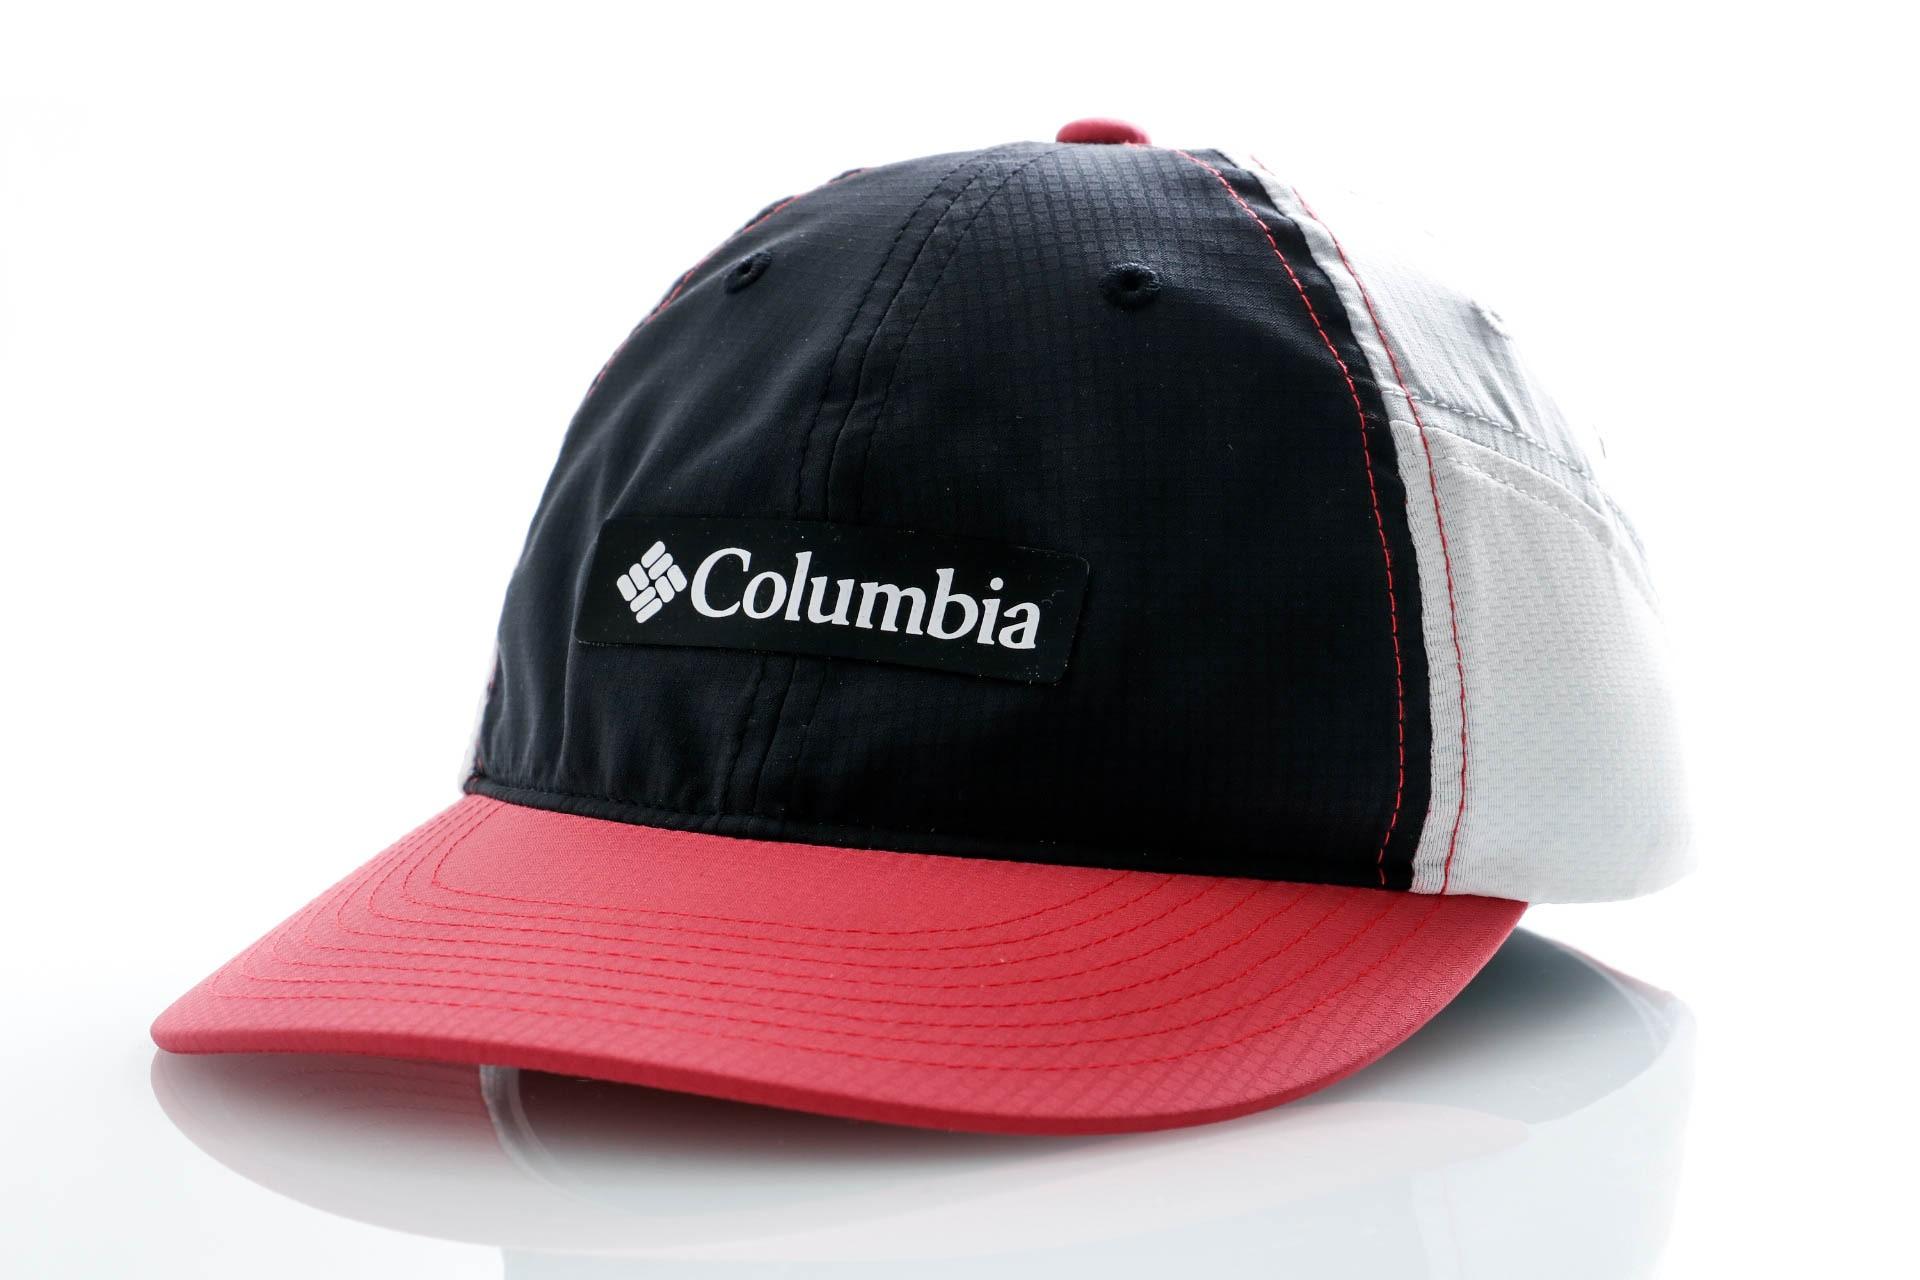 Foto van Columbia 5 Panel Cap Ripstop Ball Cap-Black, Rouge Pi Black, Rouge Pink, Cirrus Grey, White 1886811